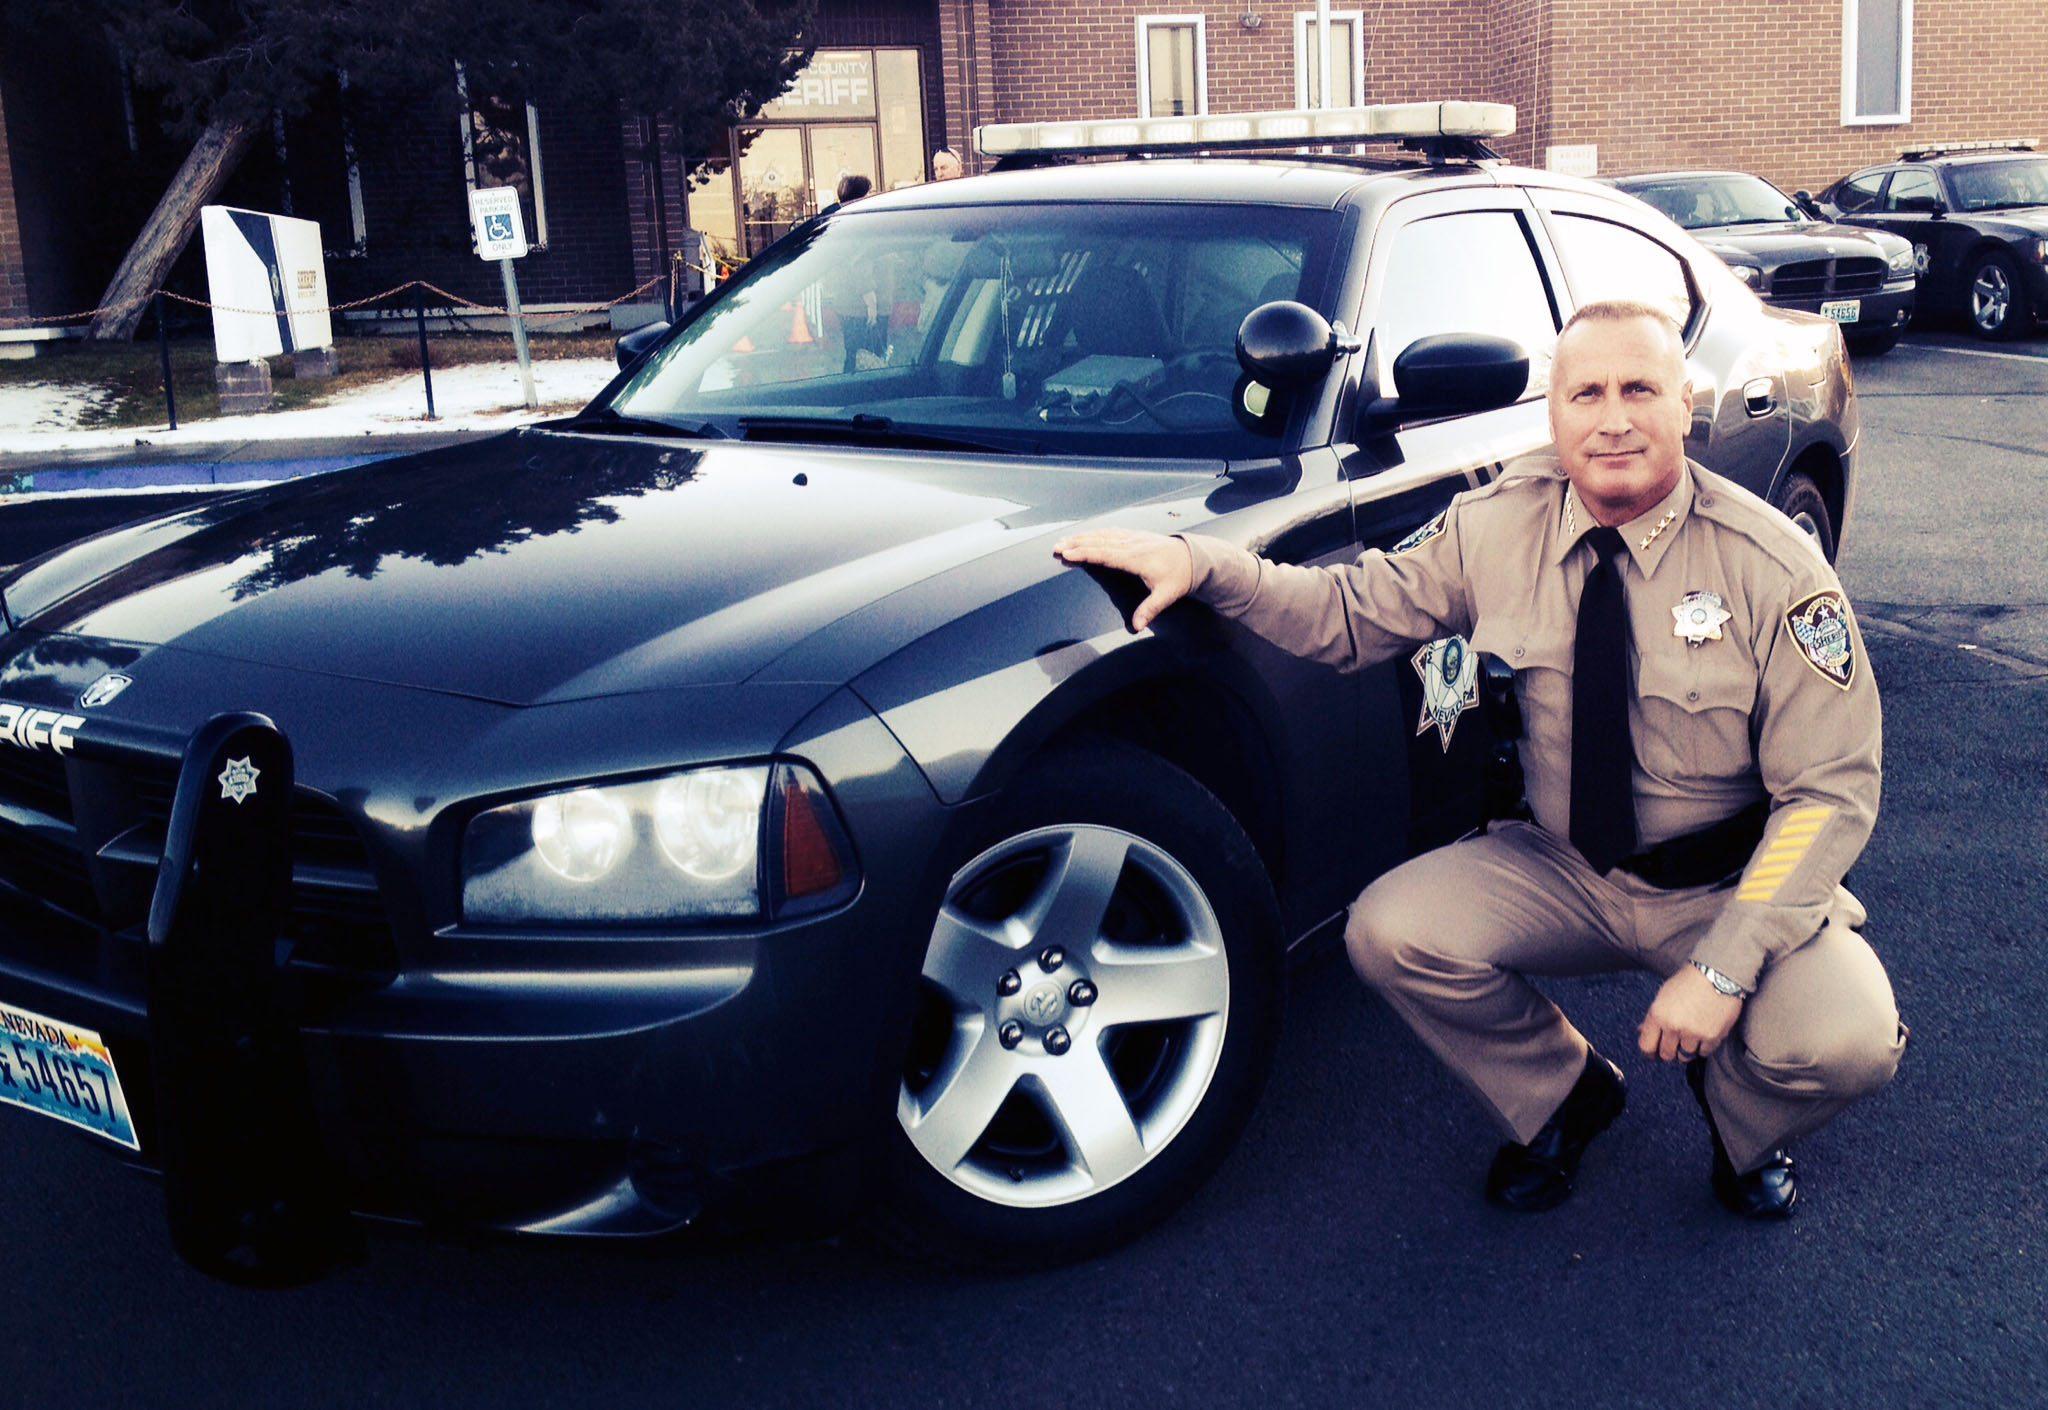 Sheriff Handte files for November election